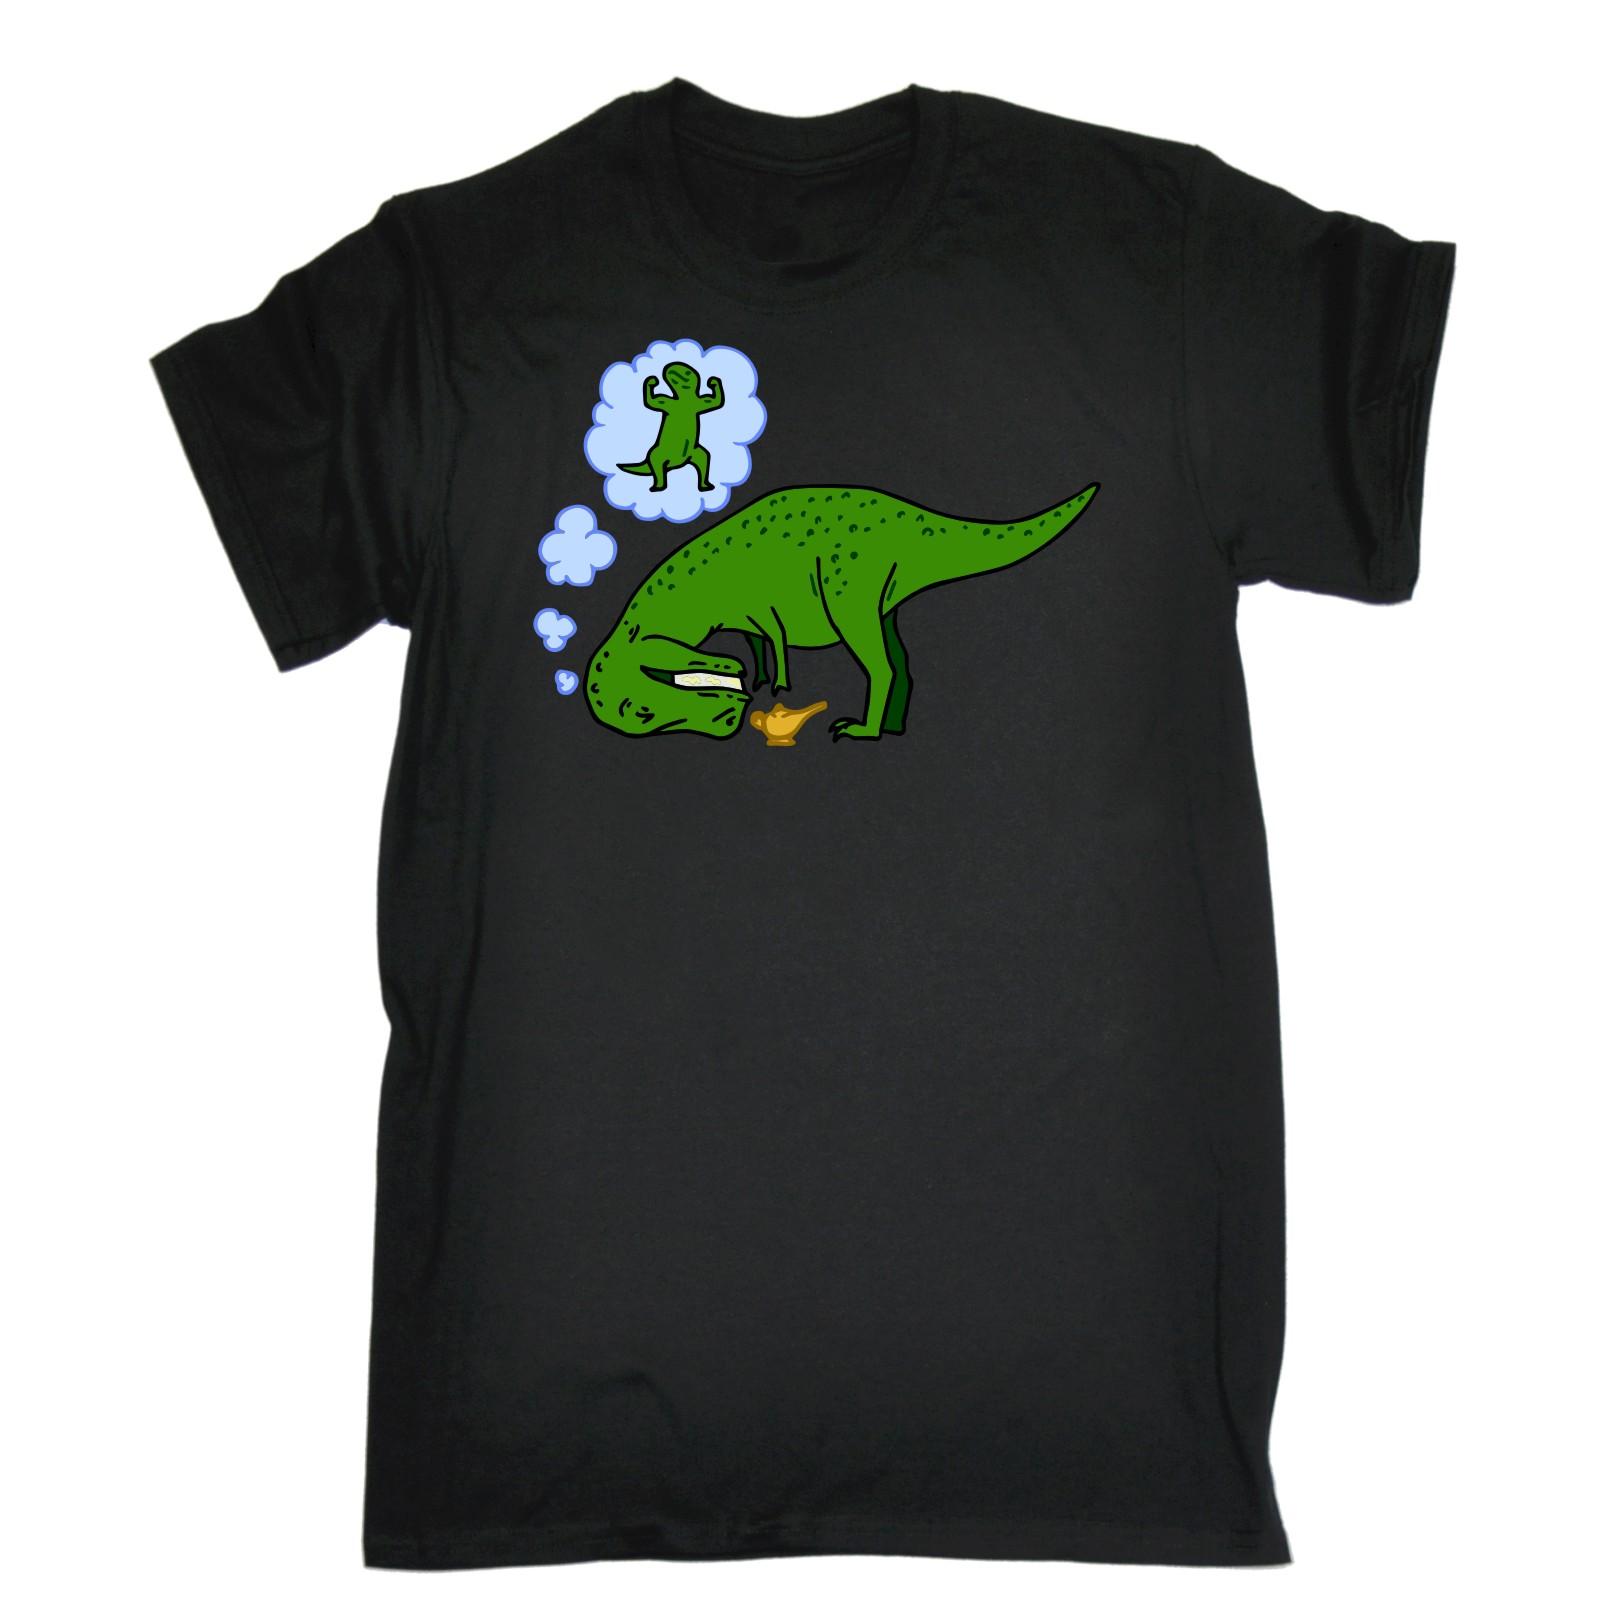 Dinosaur Wish T-Rex Funny Joke Tee T-SHIRT Birthday gift present ...